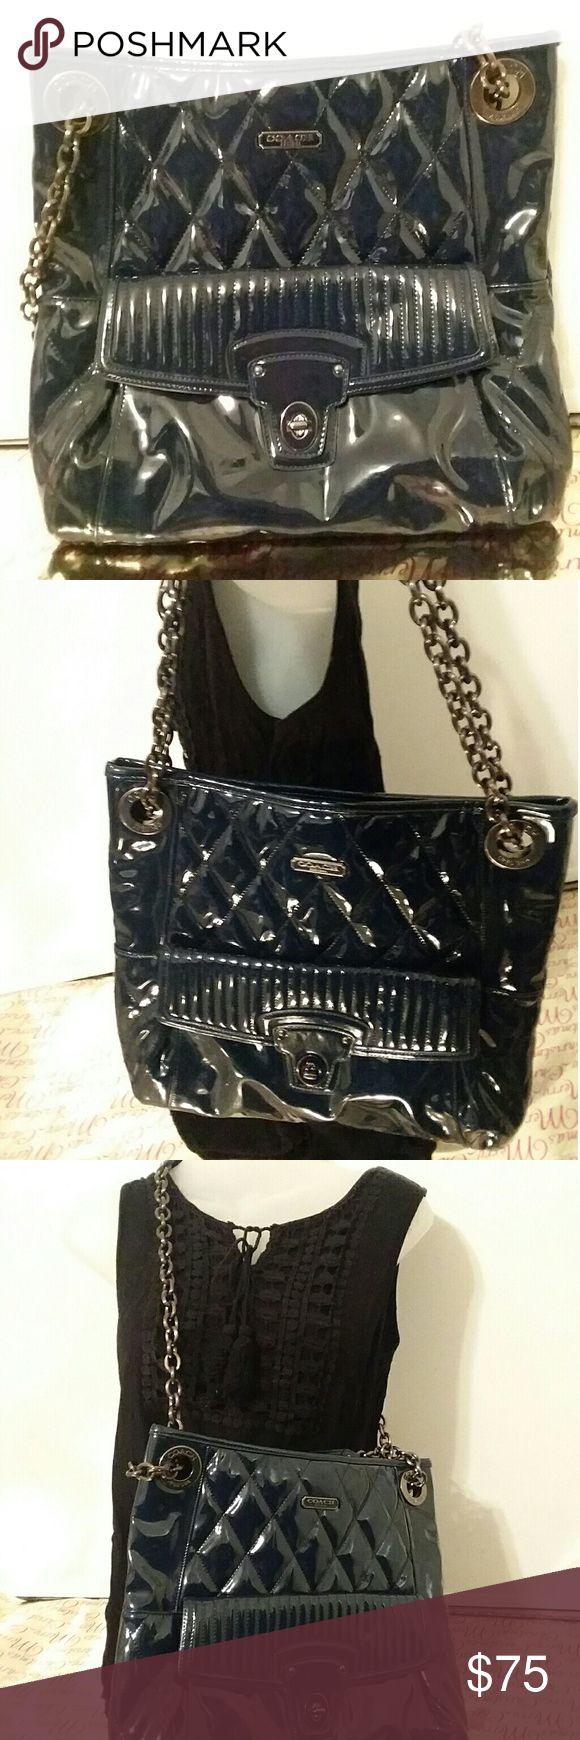 Coach Navy Shoulder Bag Coach navy shoulder bag. Good condition. NO TRADES. Coach Bags Shoulder Bags